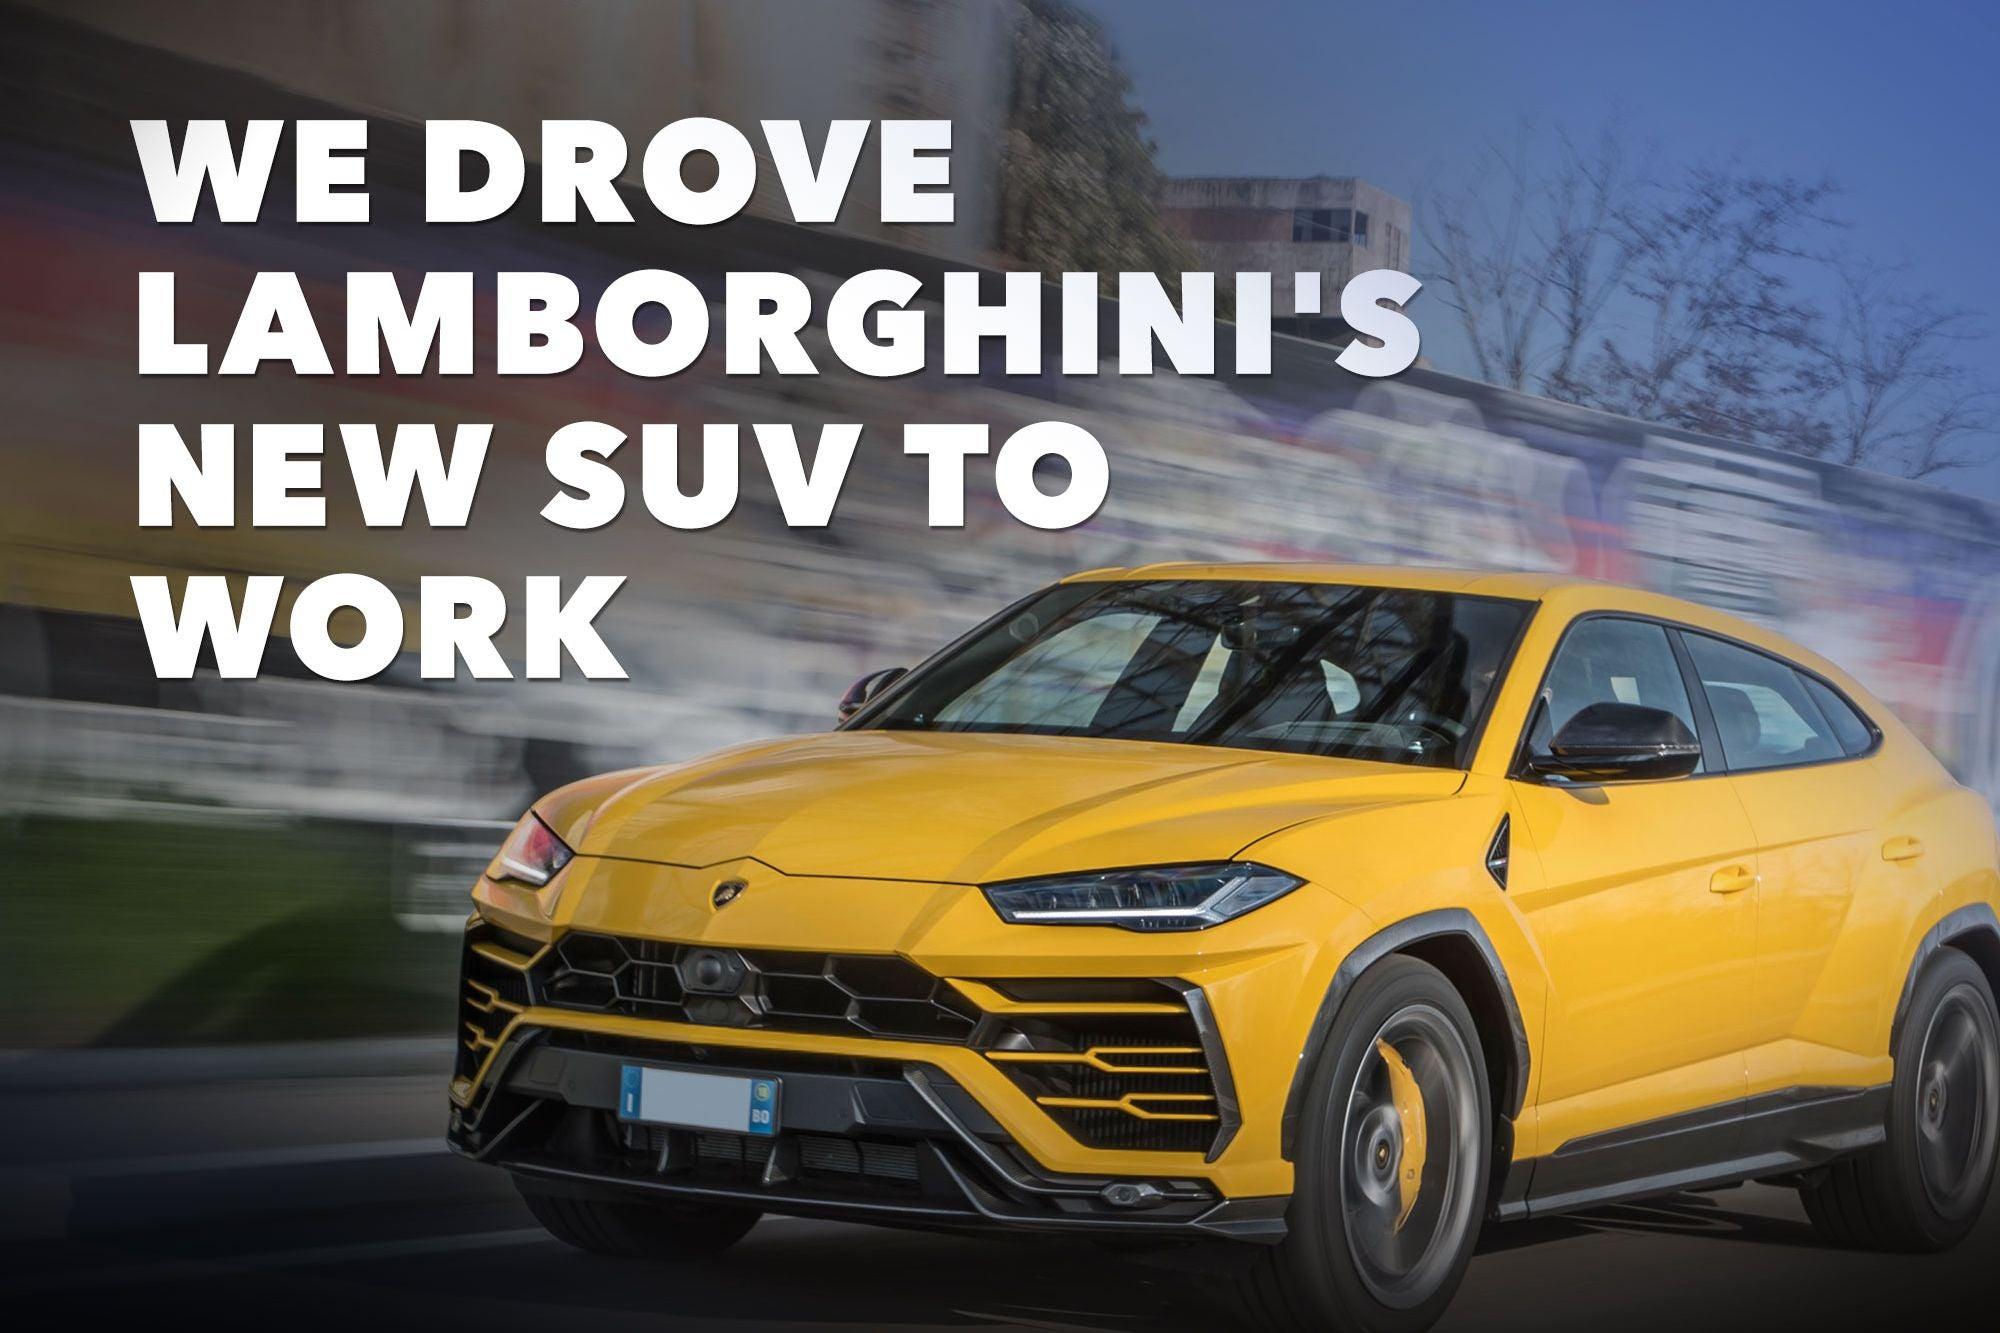 entrepreneur.com - Patrick Carone - Does Driving a $250K Lamborghini Live Up to the Dream?